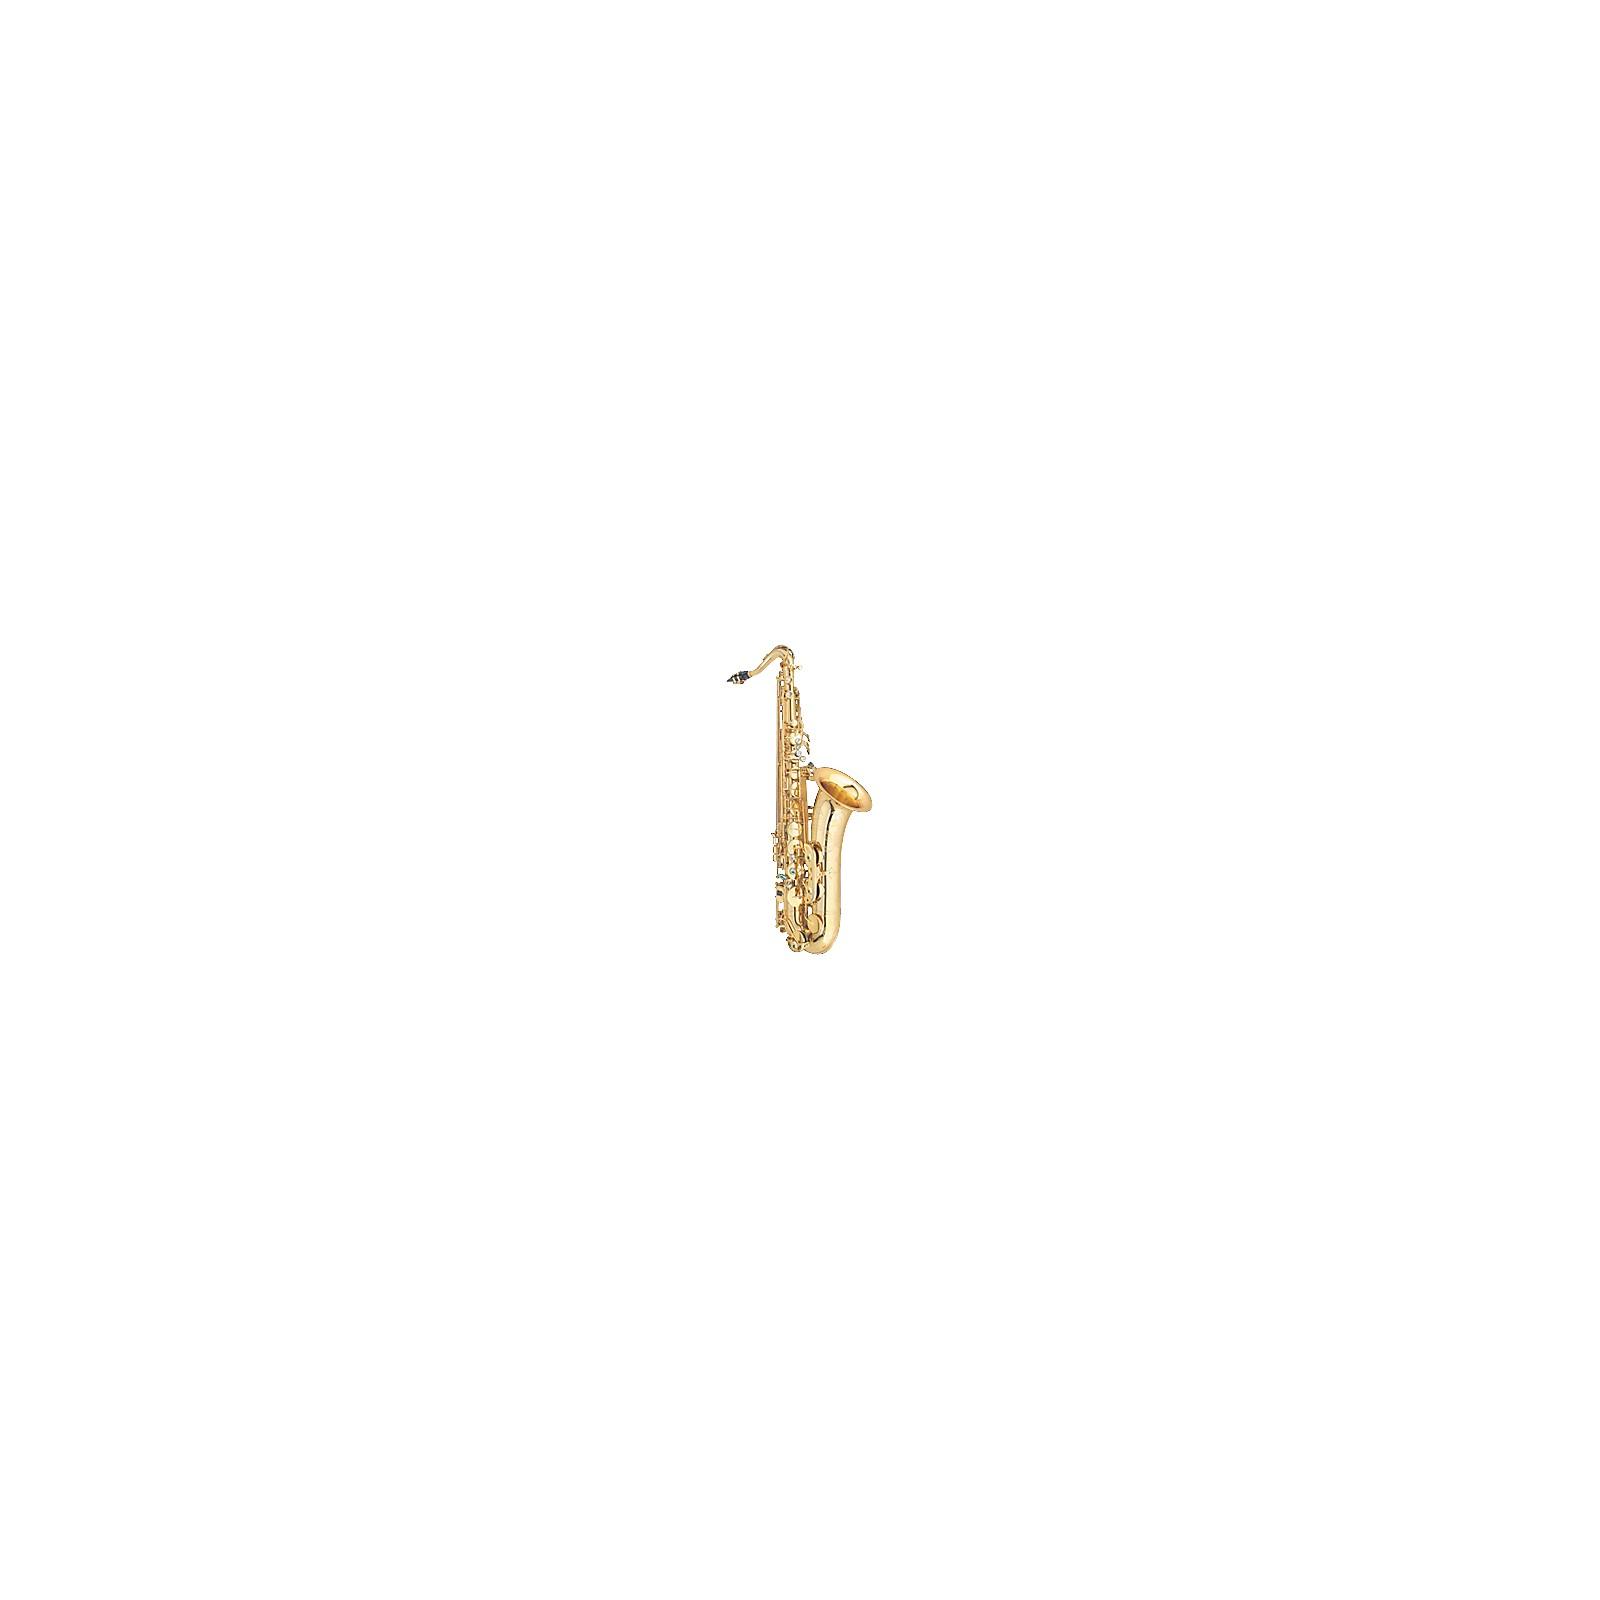 Open Box P. Mauriat System 76 Professional Tenor Saxophone